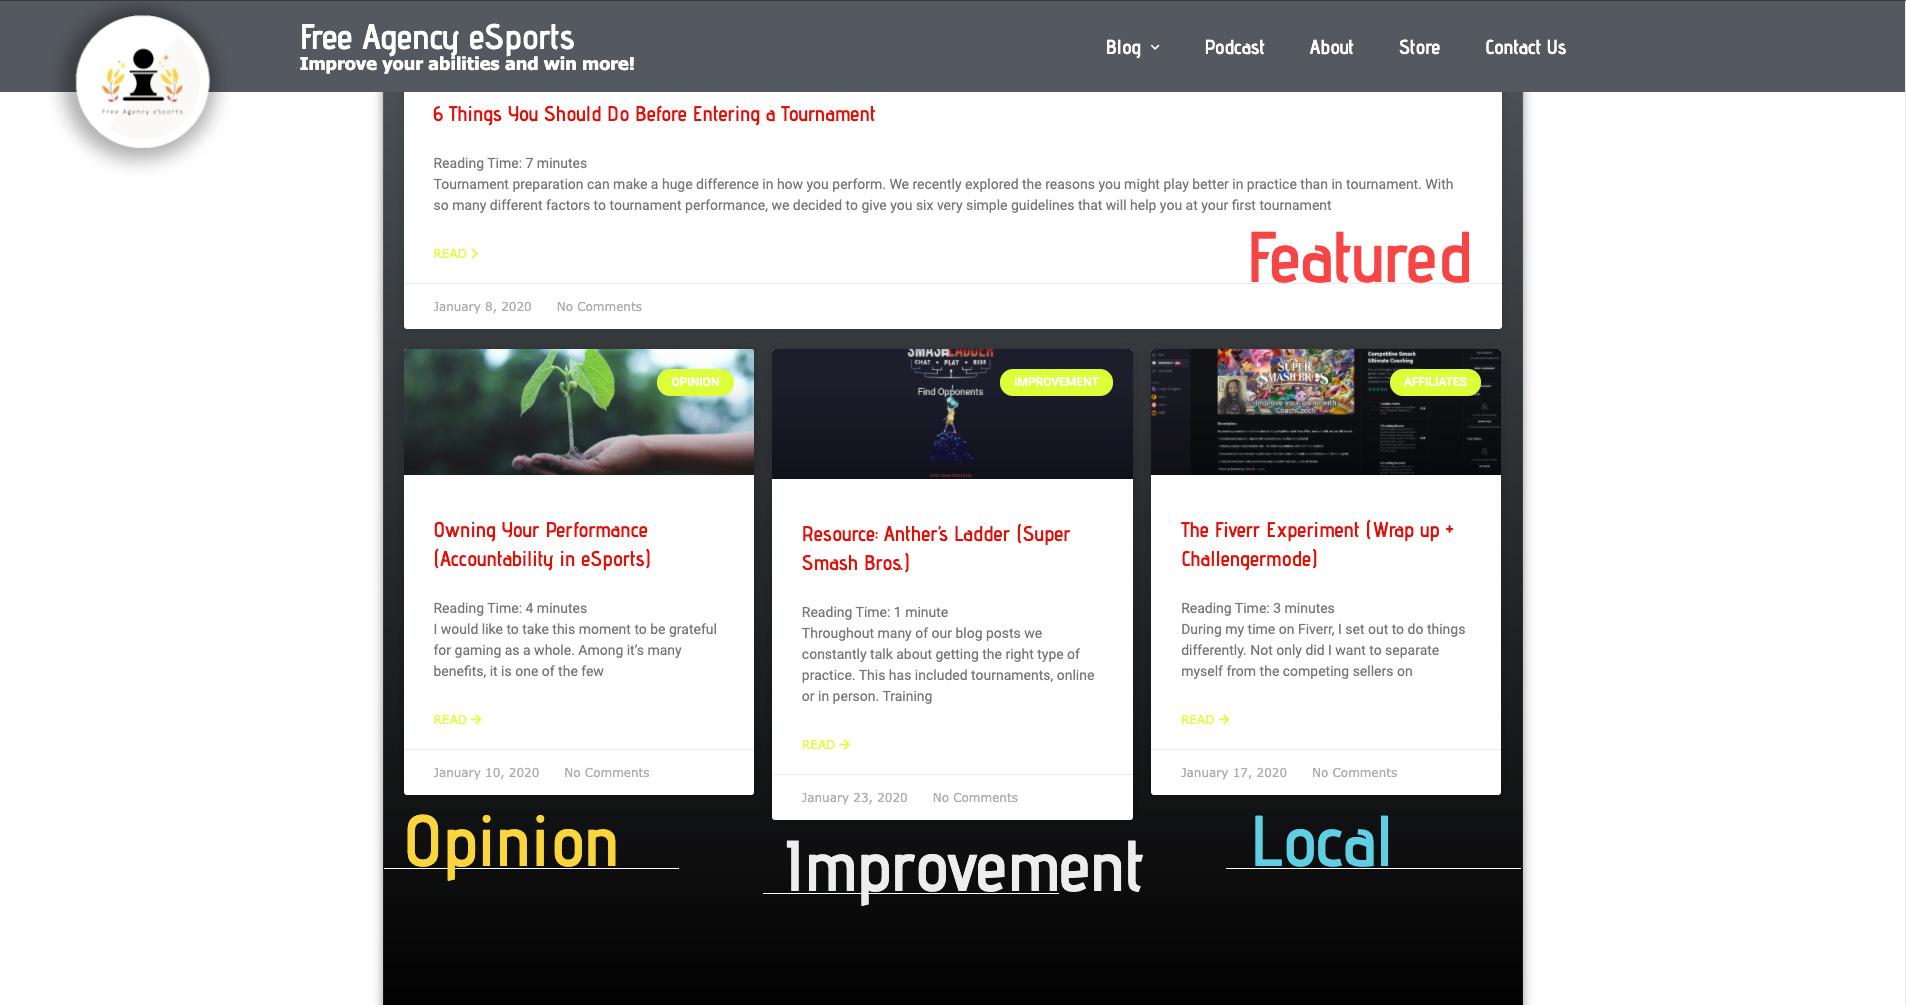 Oseeyo Web Development and Design - news agency website - Vero Beach, FL